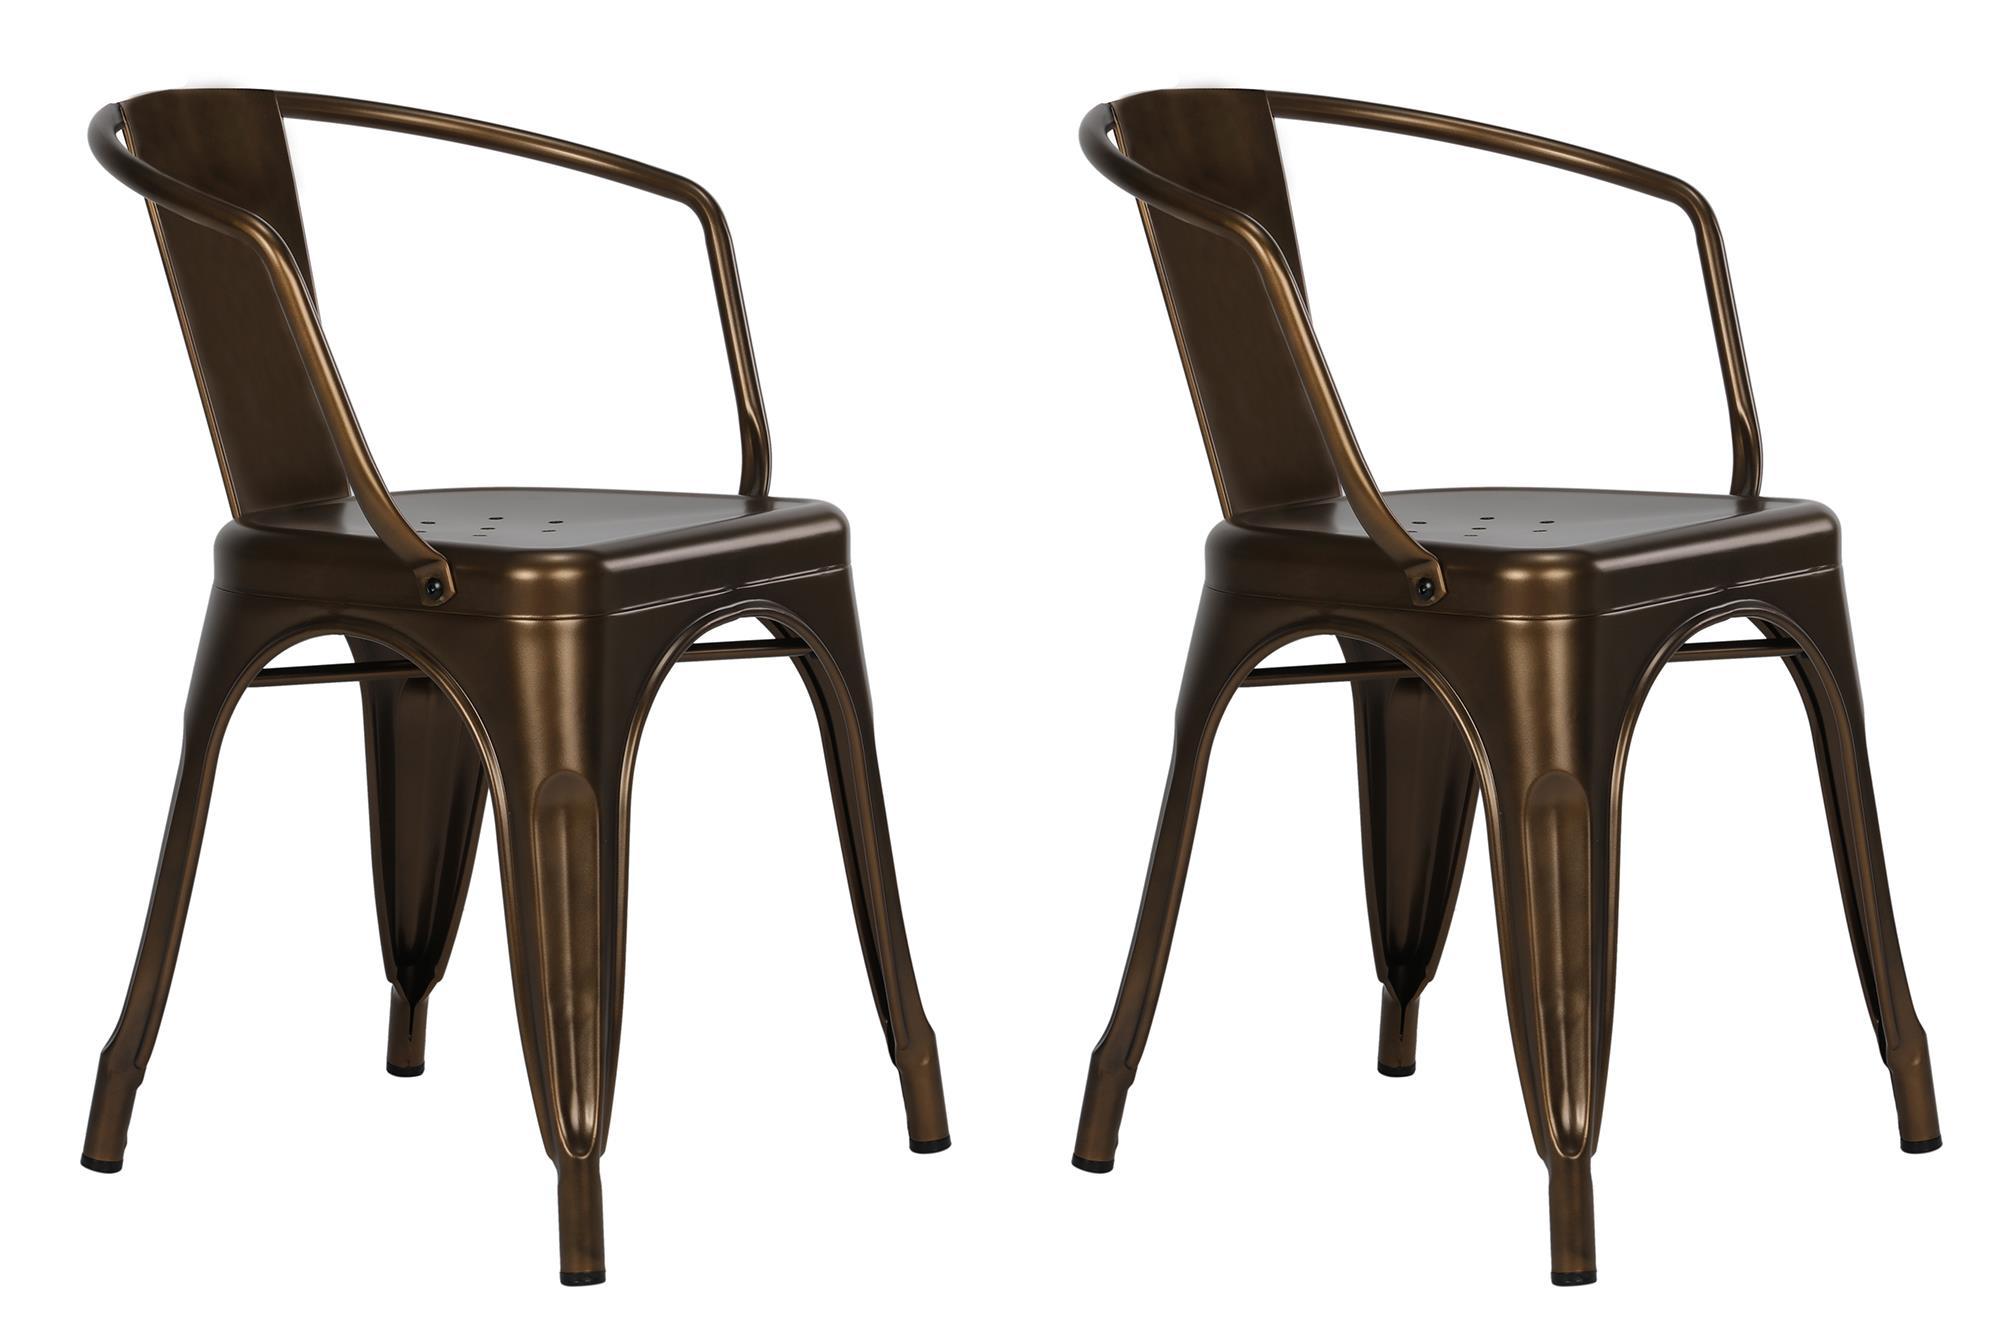 Dorel Home Furnishings Elise Antique Bronze Metal Dining Chair, Set of 2